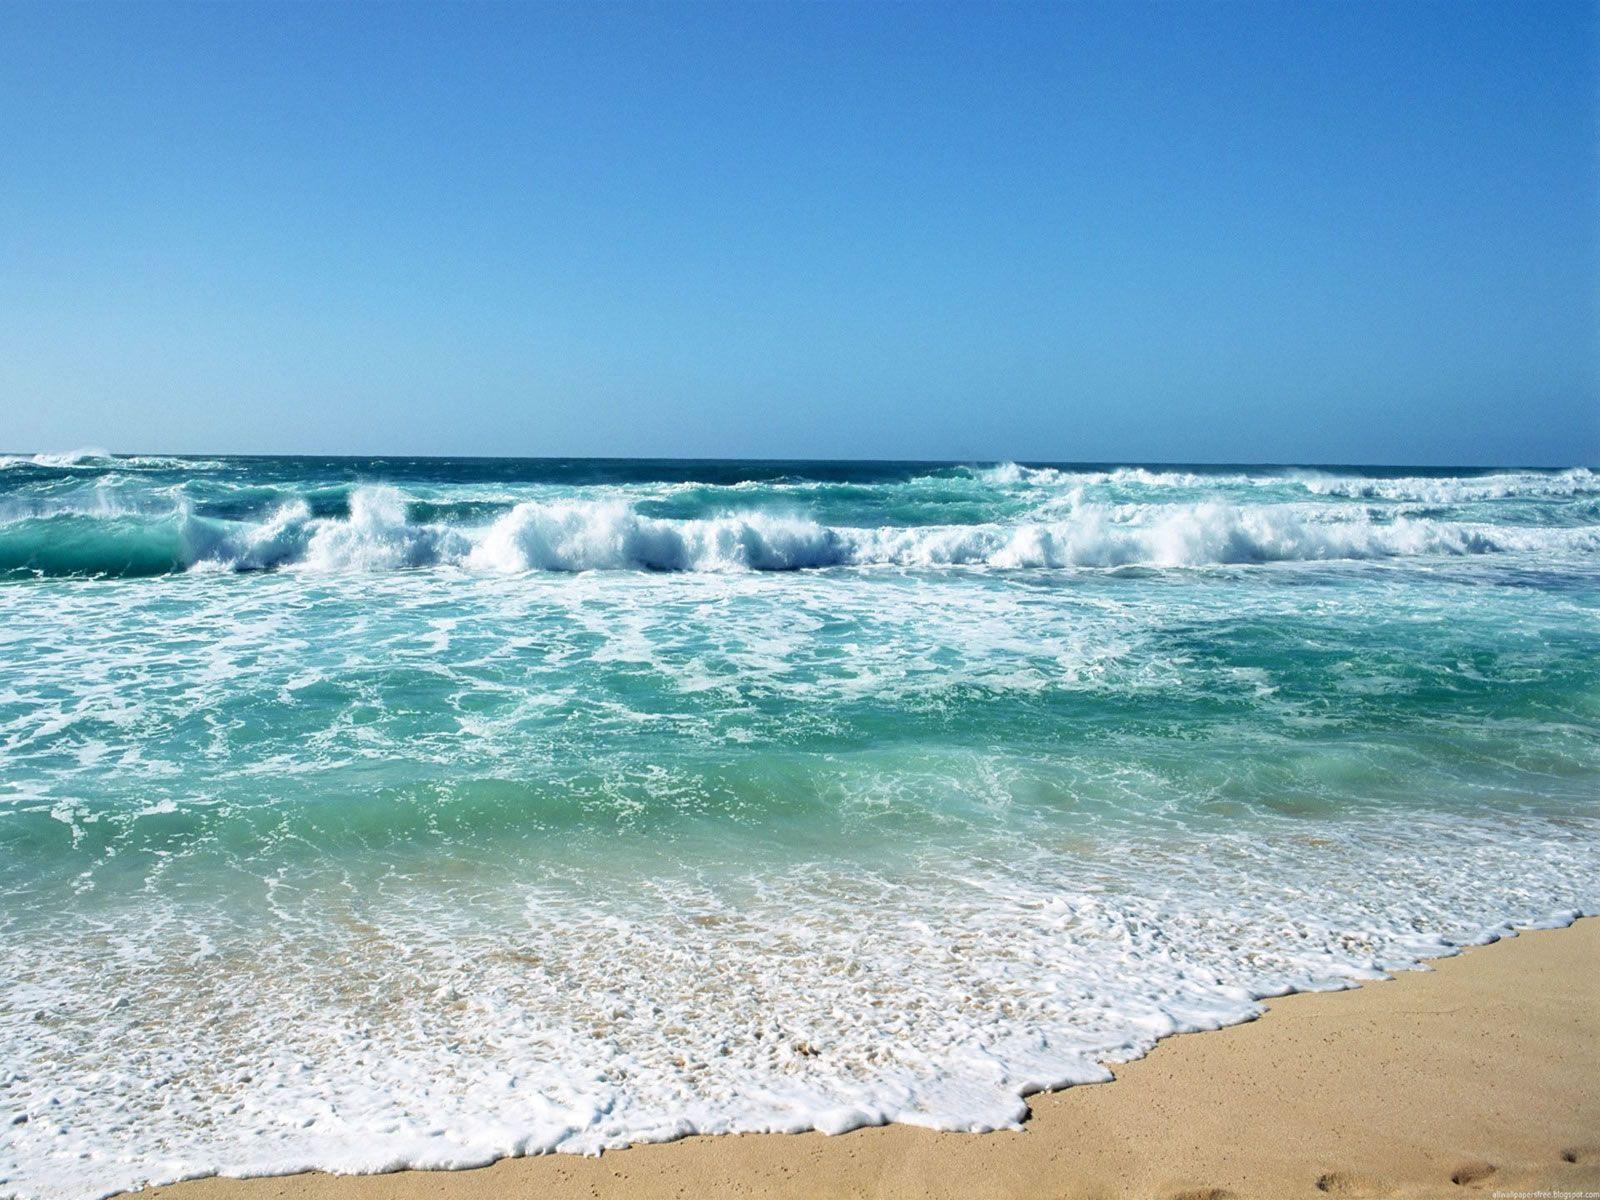 Mar praias ondas - Pesquisa Google